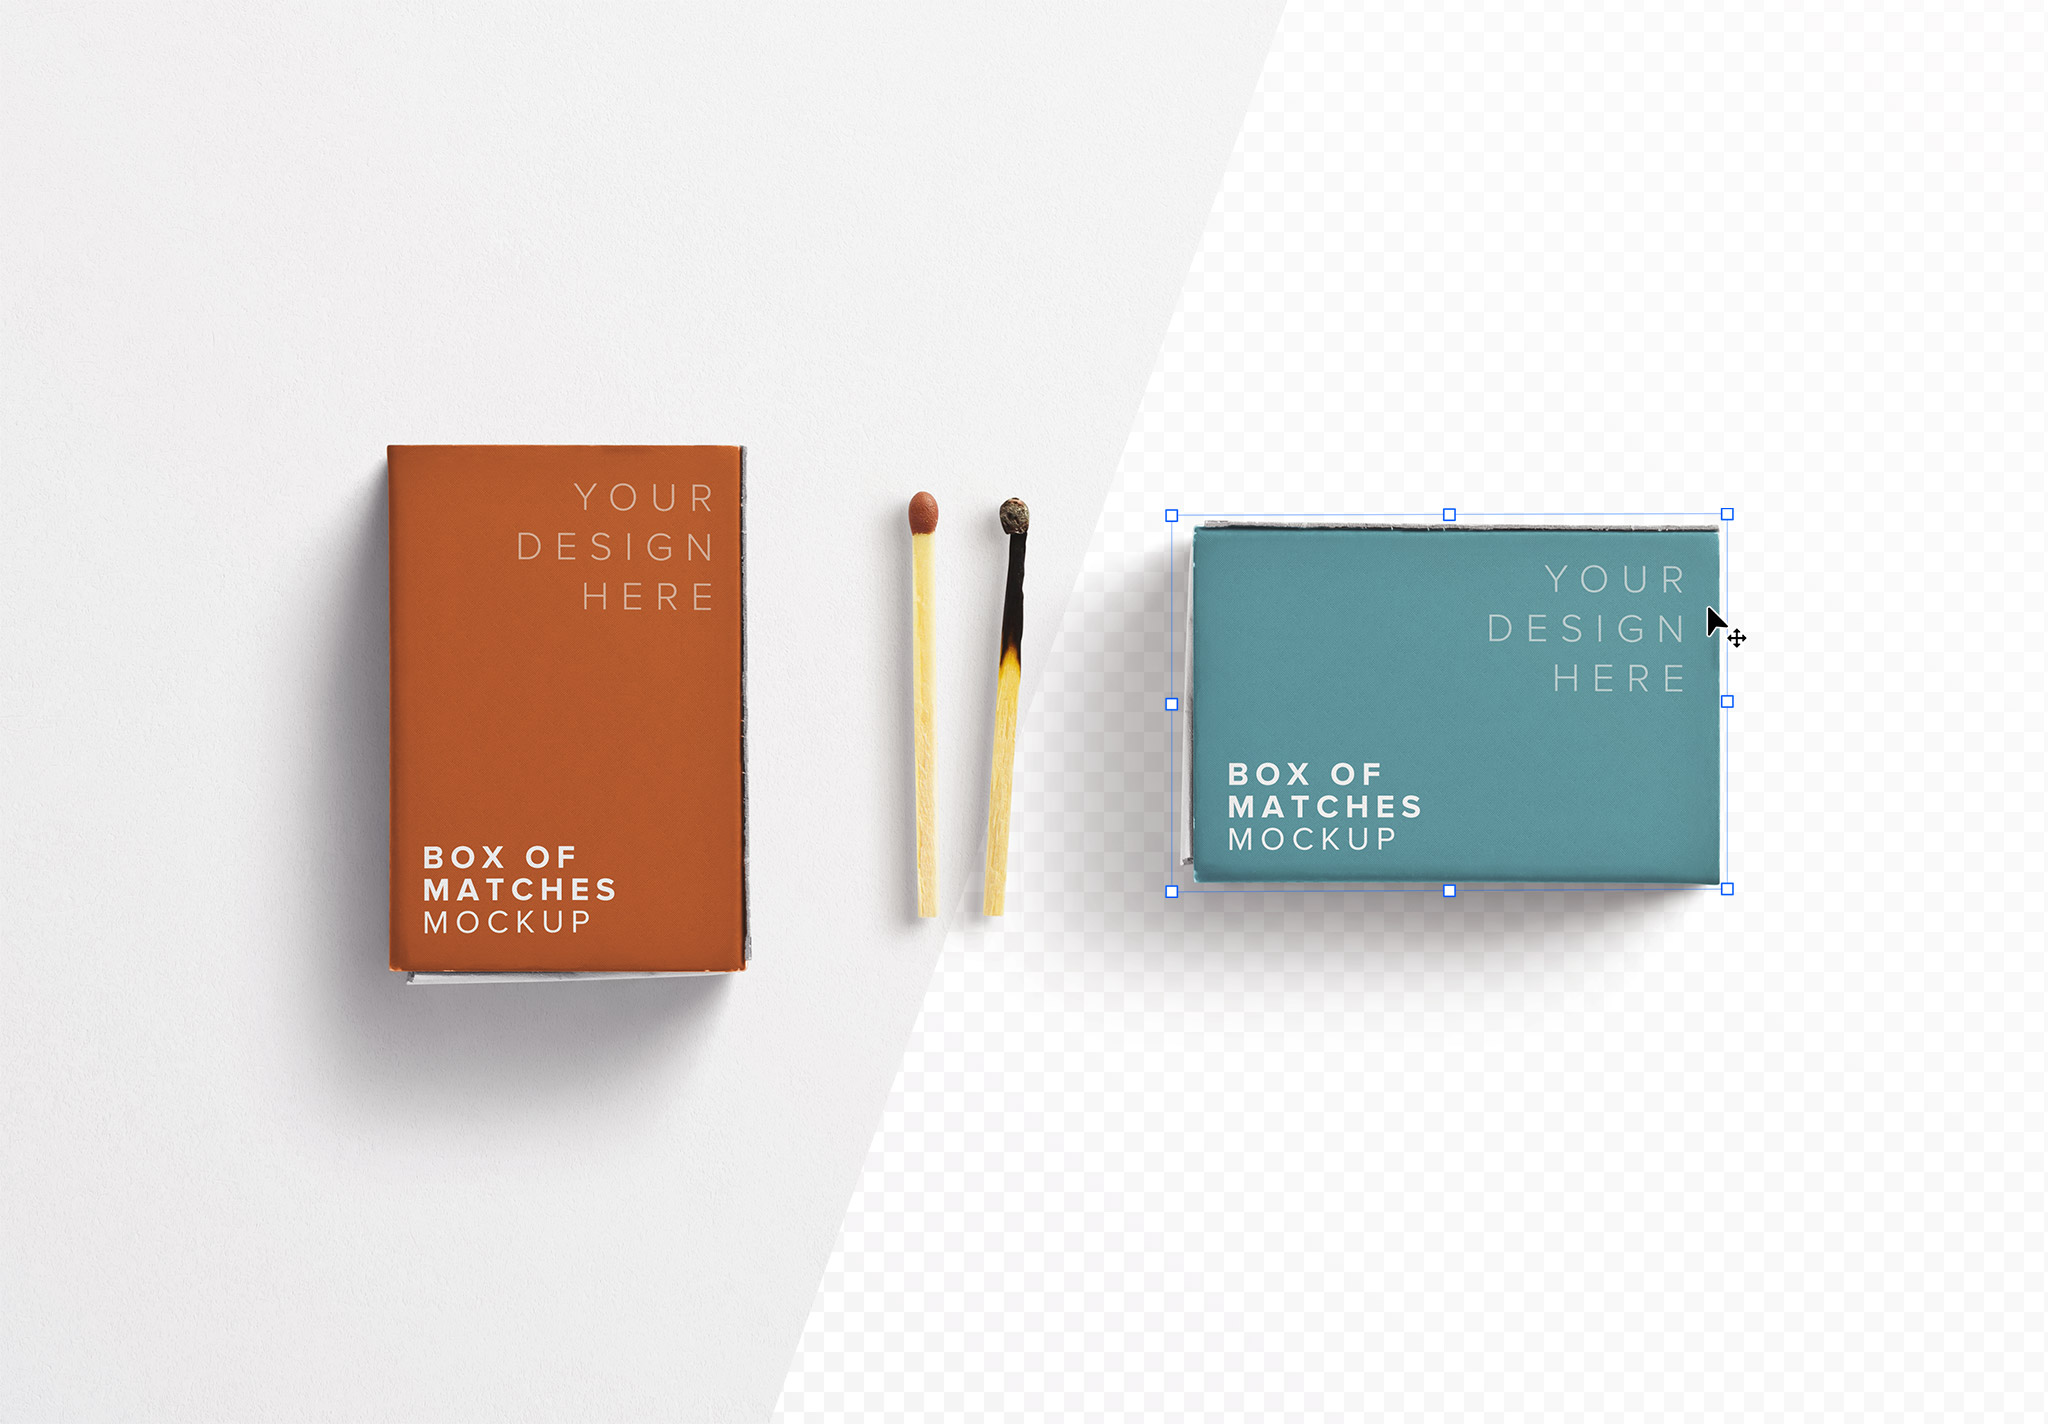 Box Matches Mockup image01